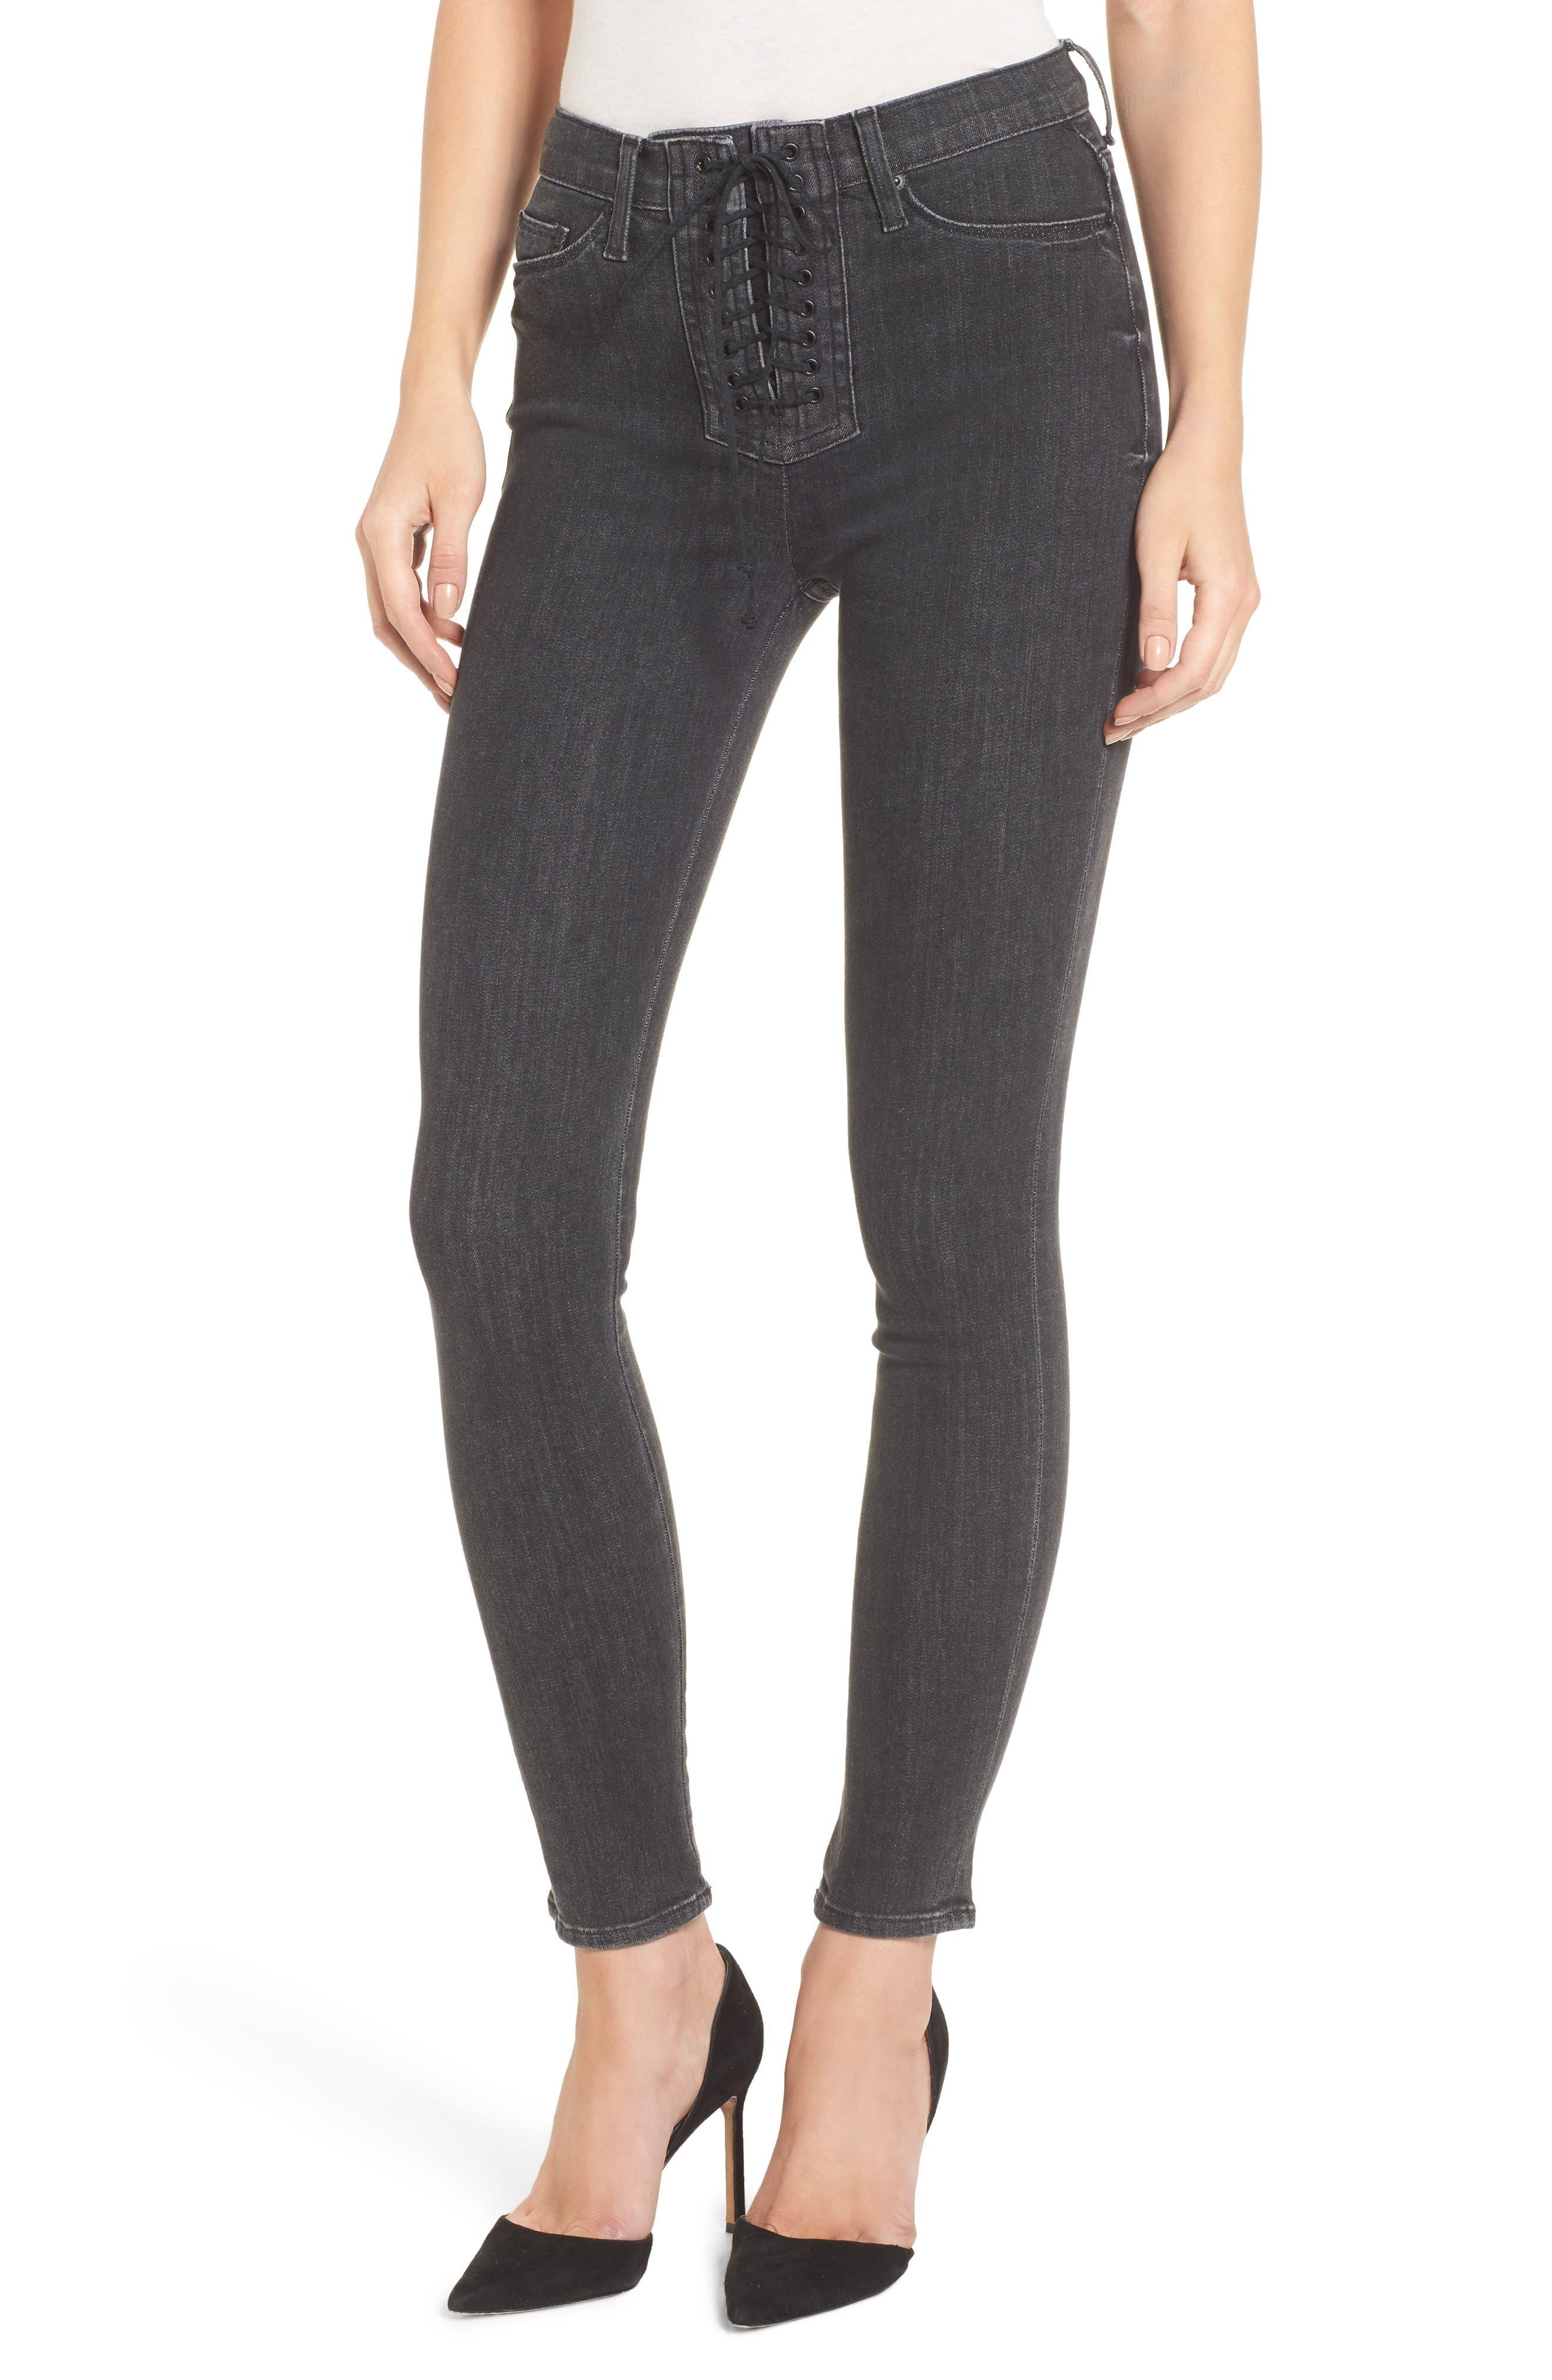 Main Image - Hudson Jeans Bullocks High Waist Lace-Up Skinny Jeans (Disarm)